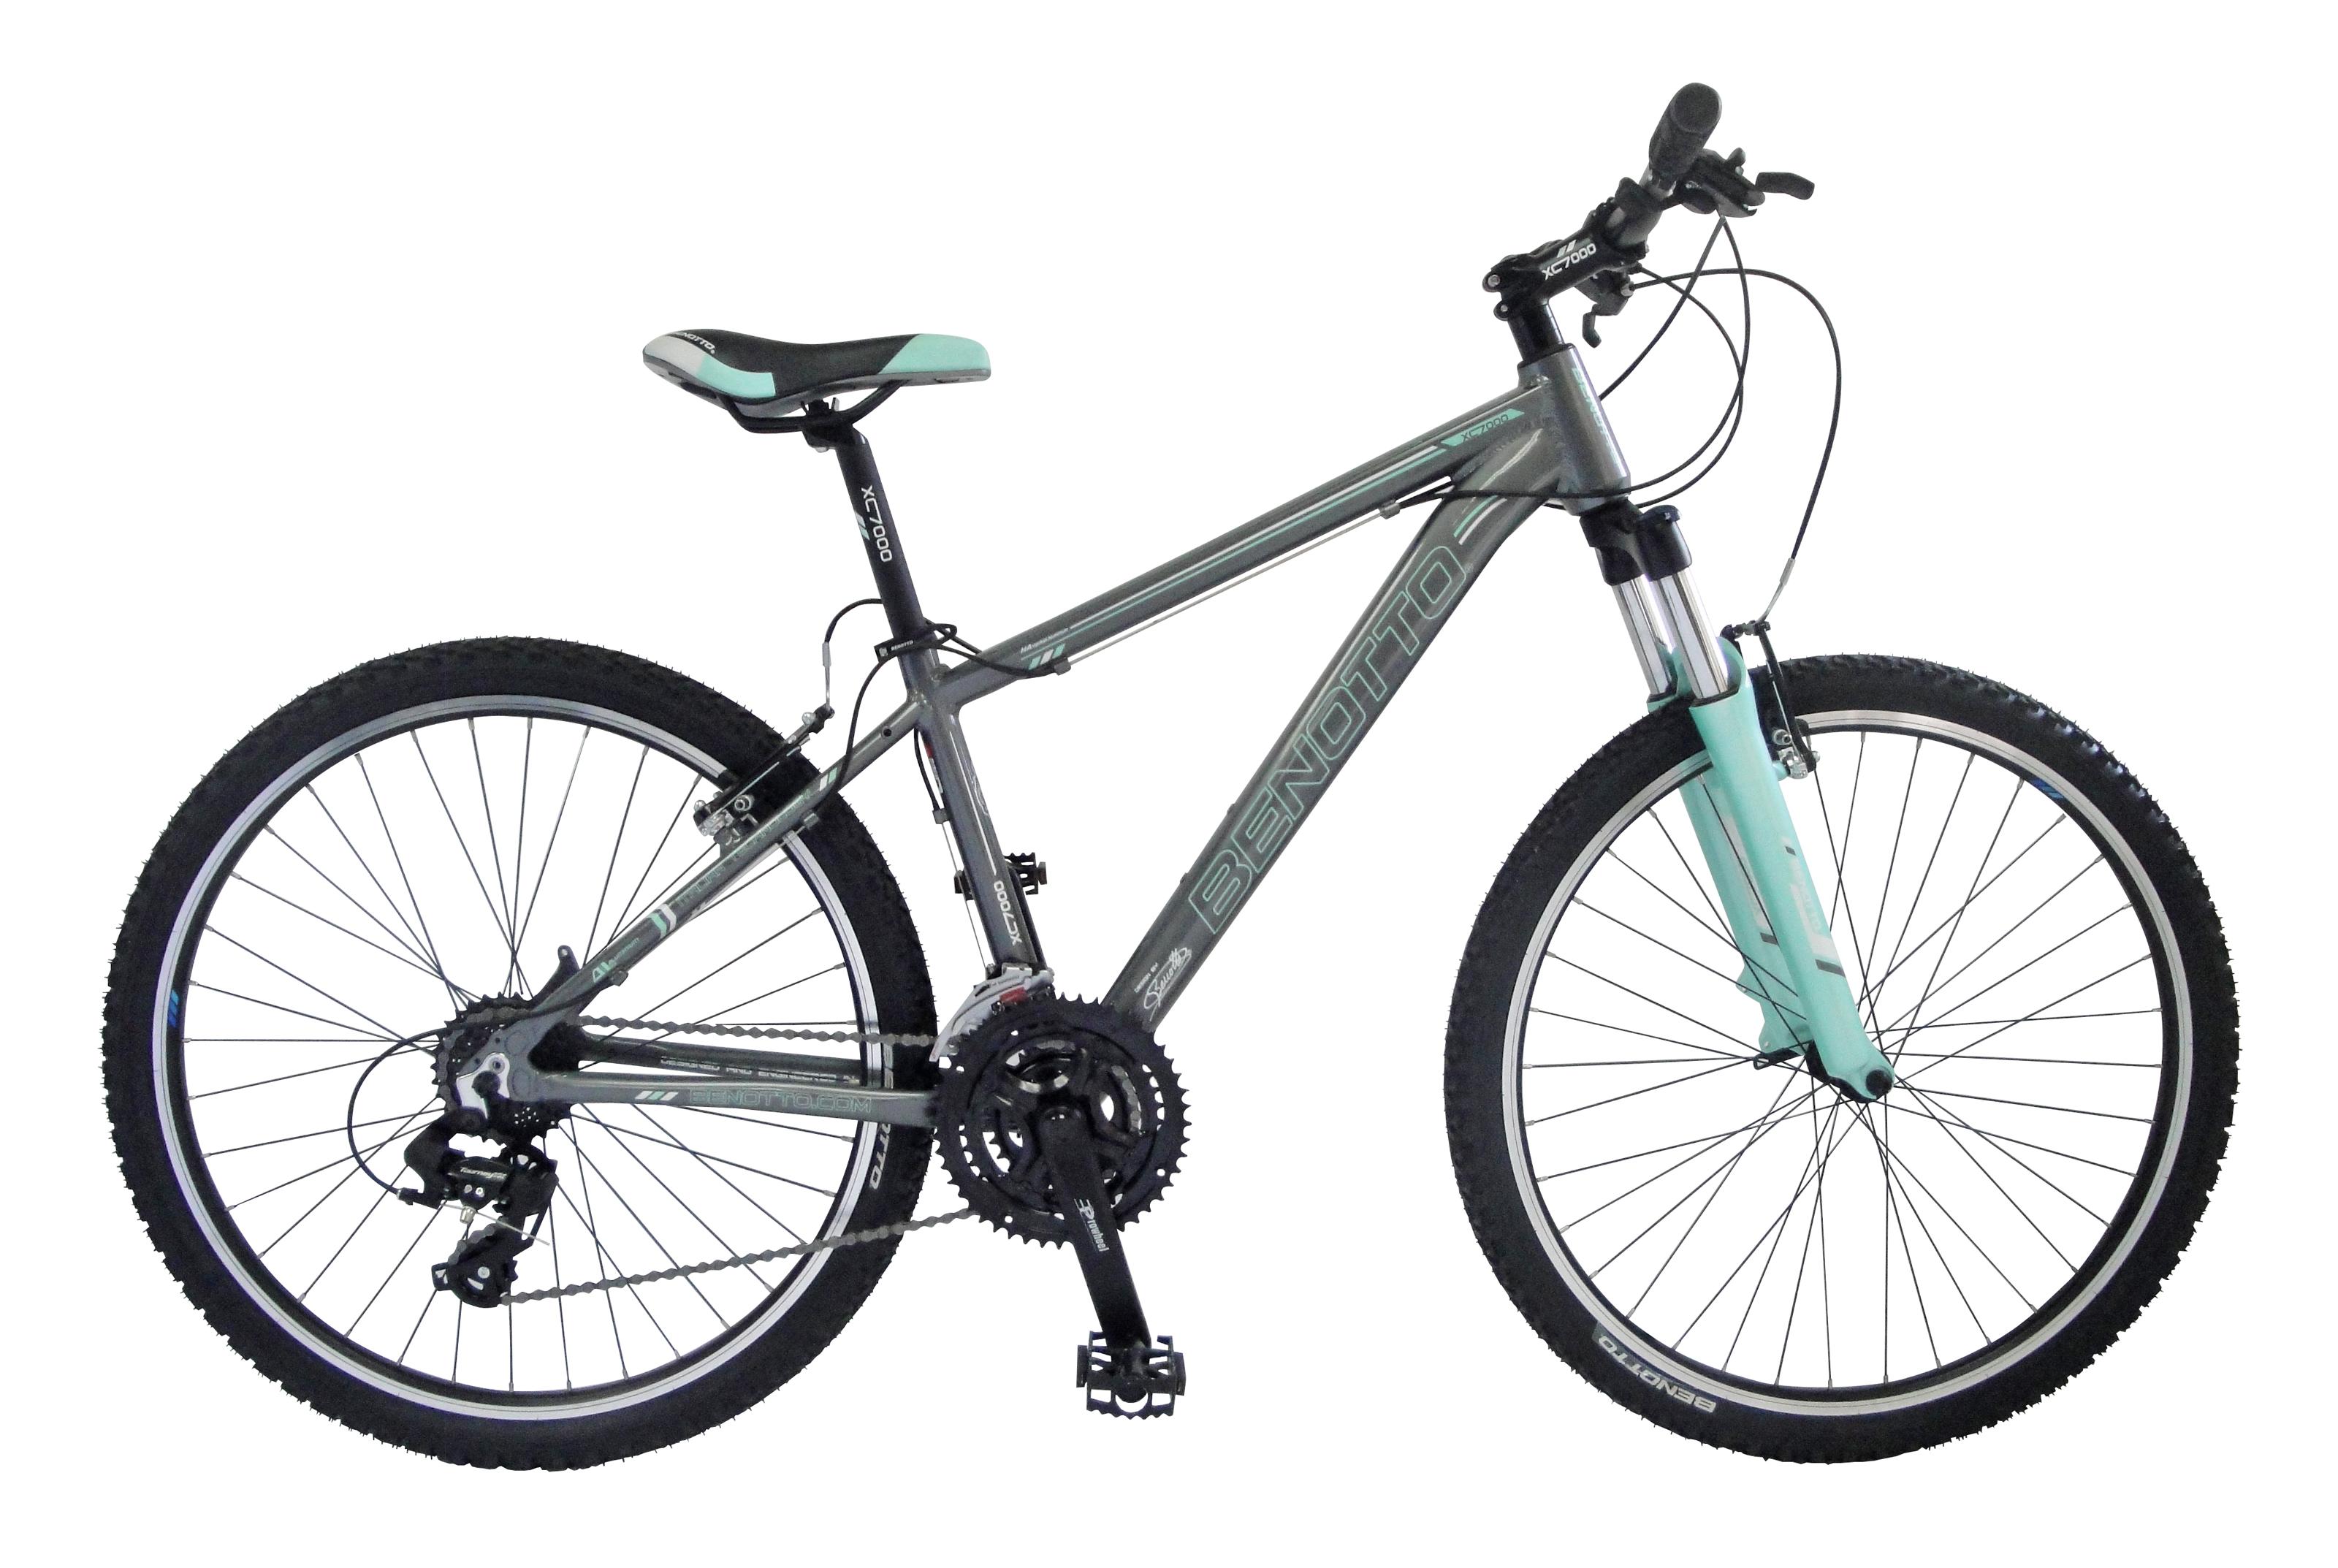 Bicicleta BENOTTO Montaña XC-7000 R26 24V. Shimano Tourney